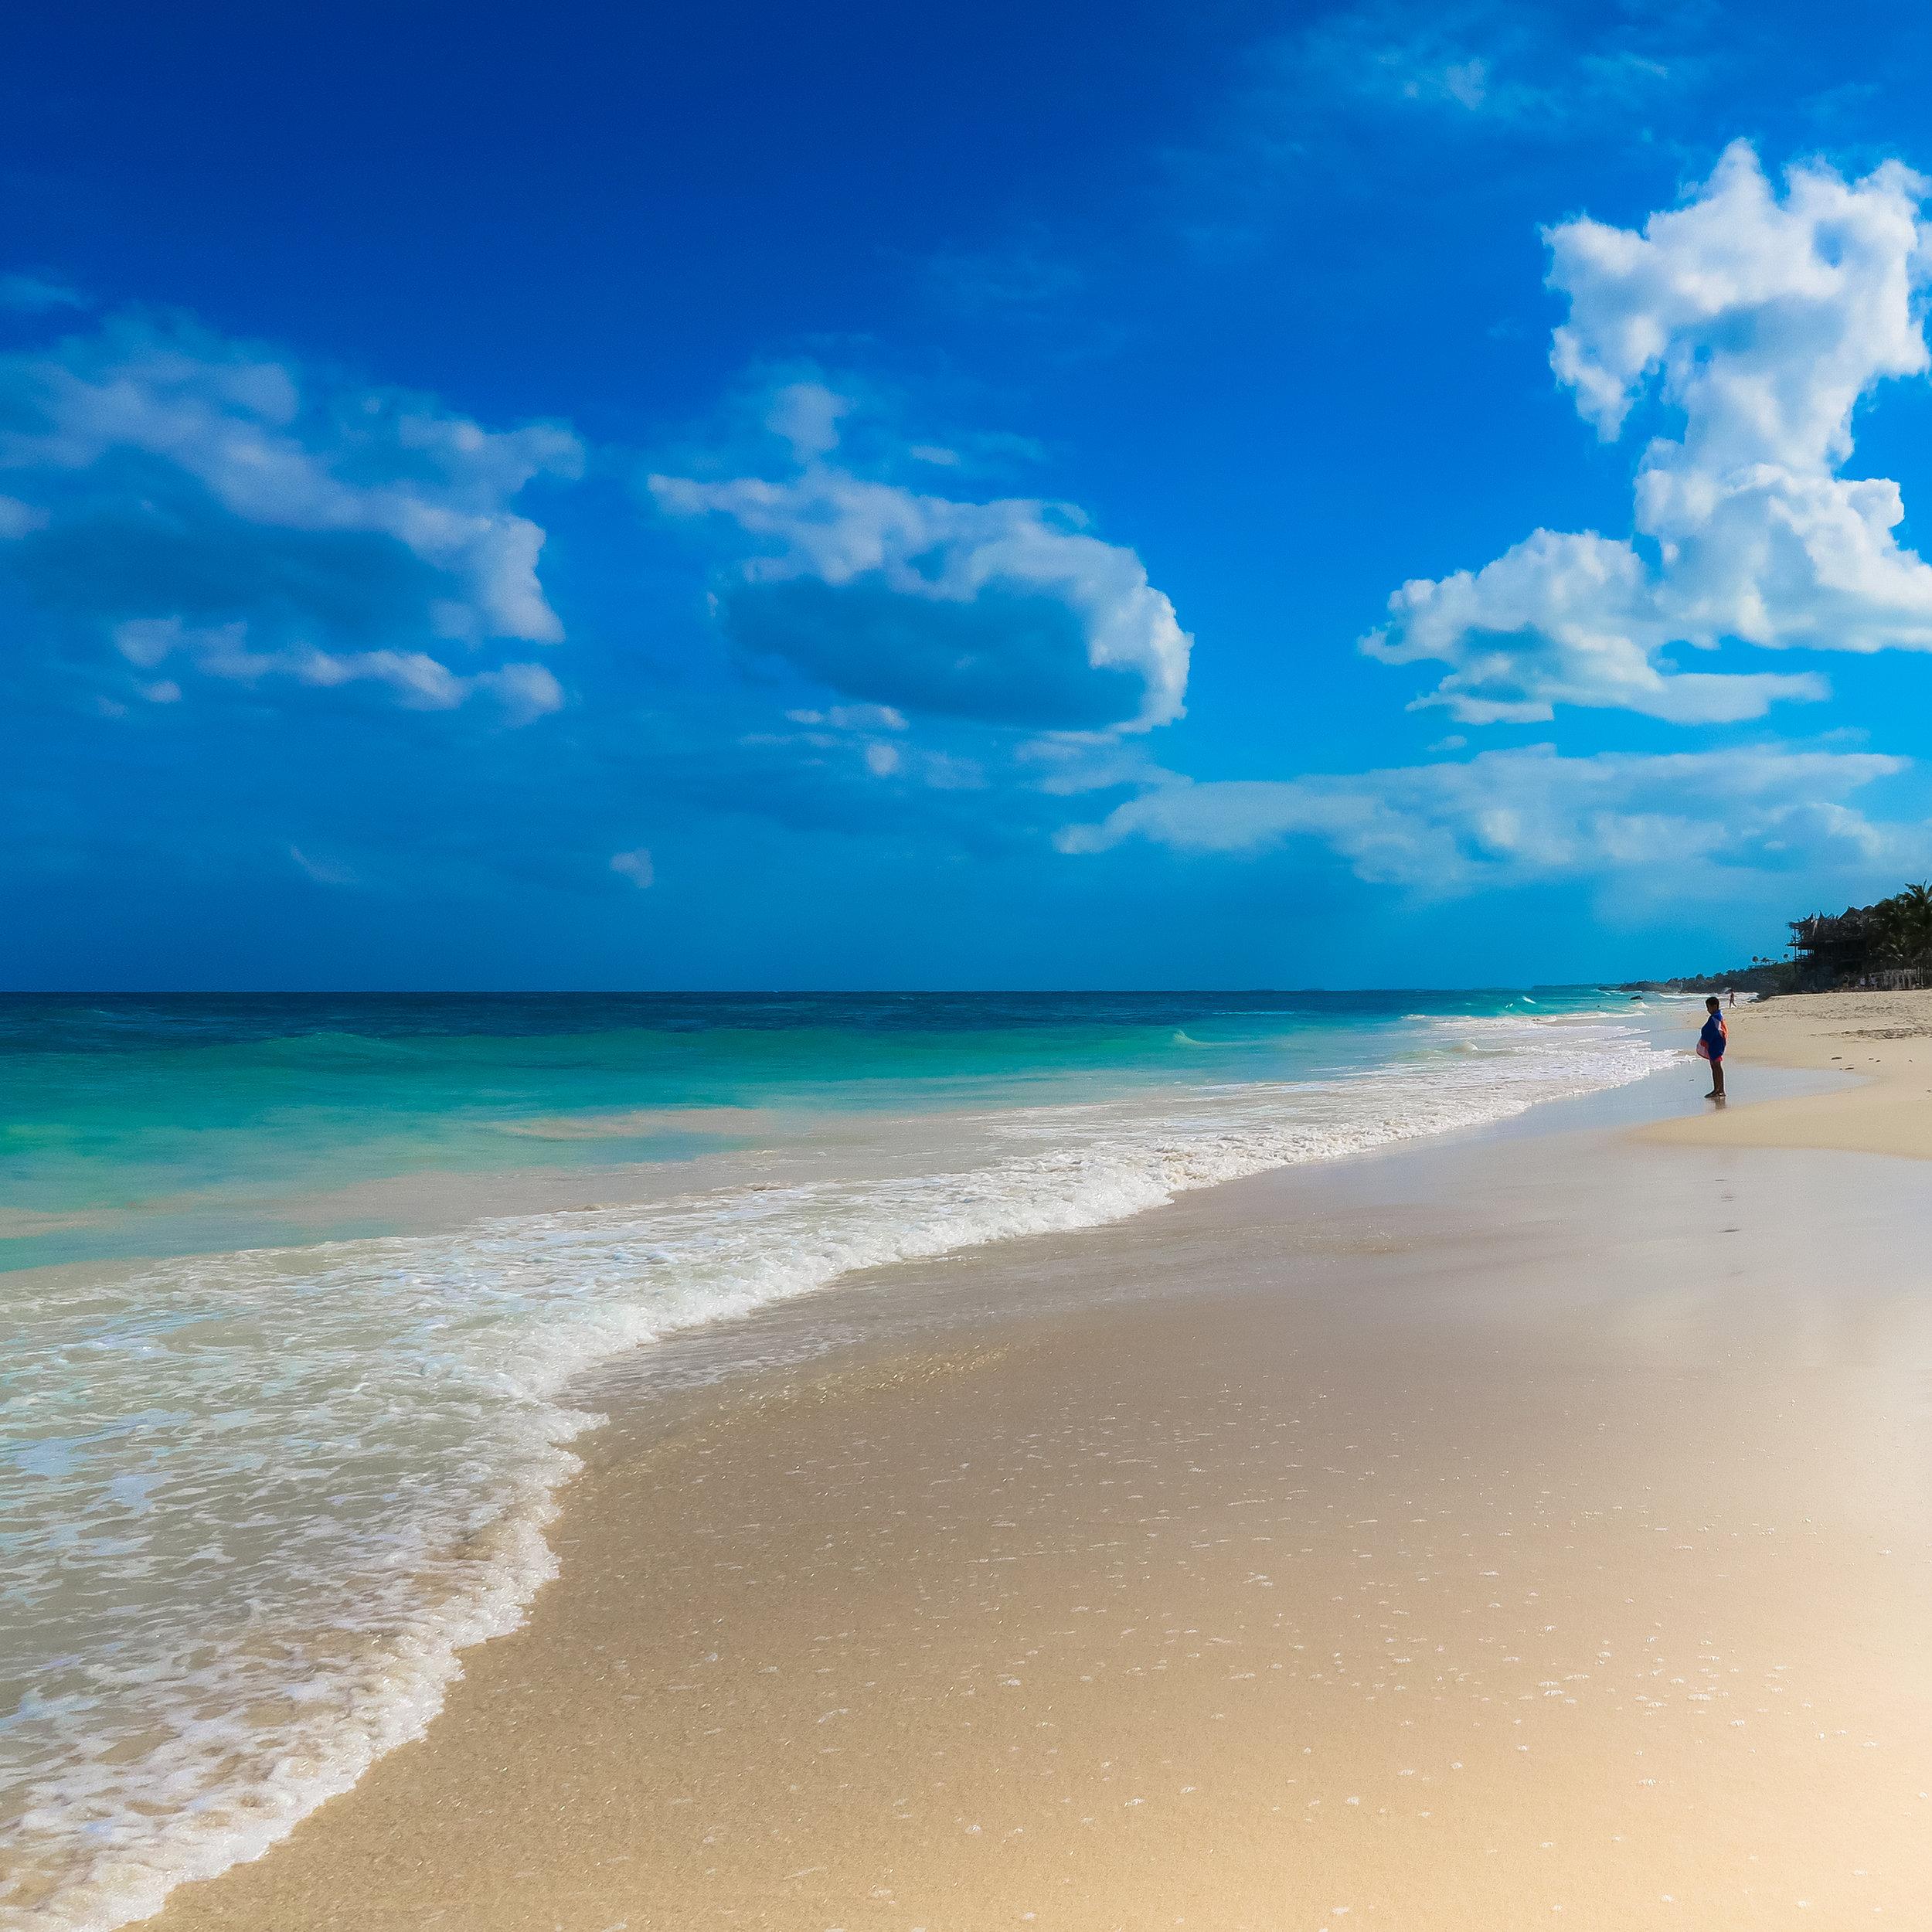 The gorgeous beach in Tulum